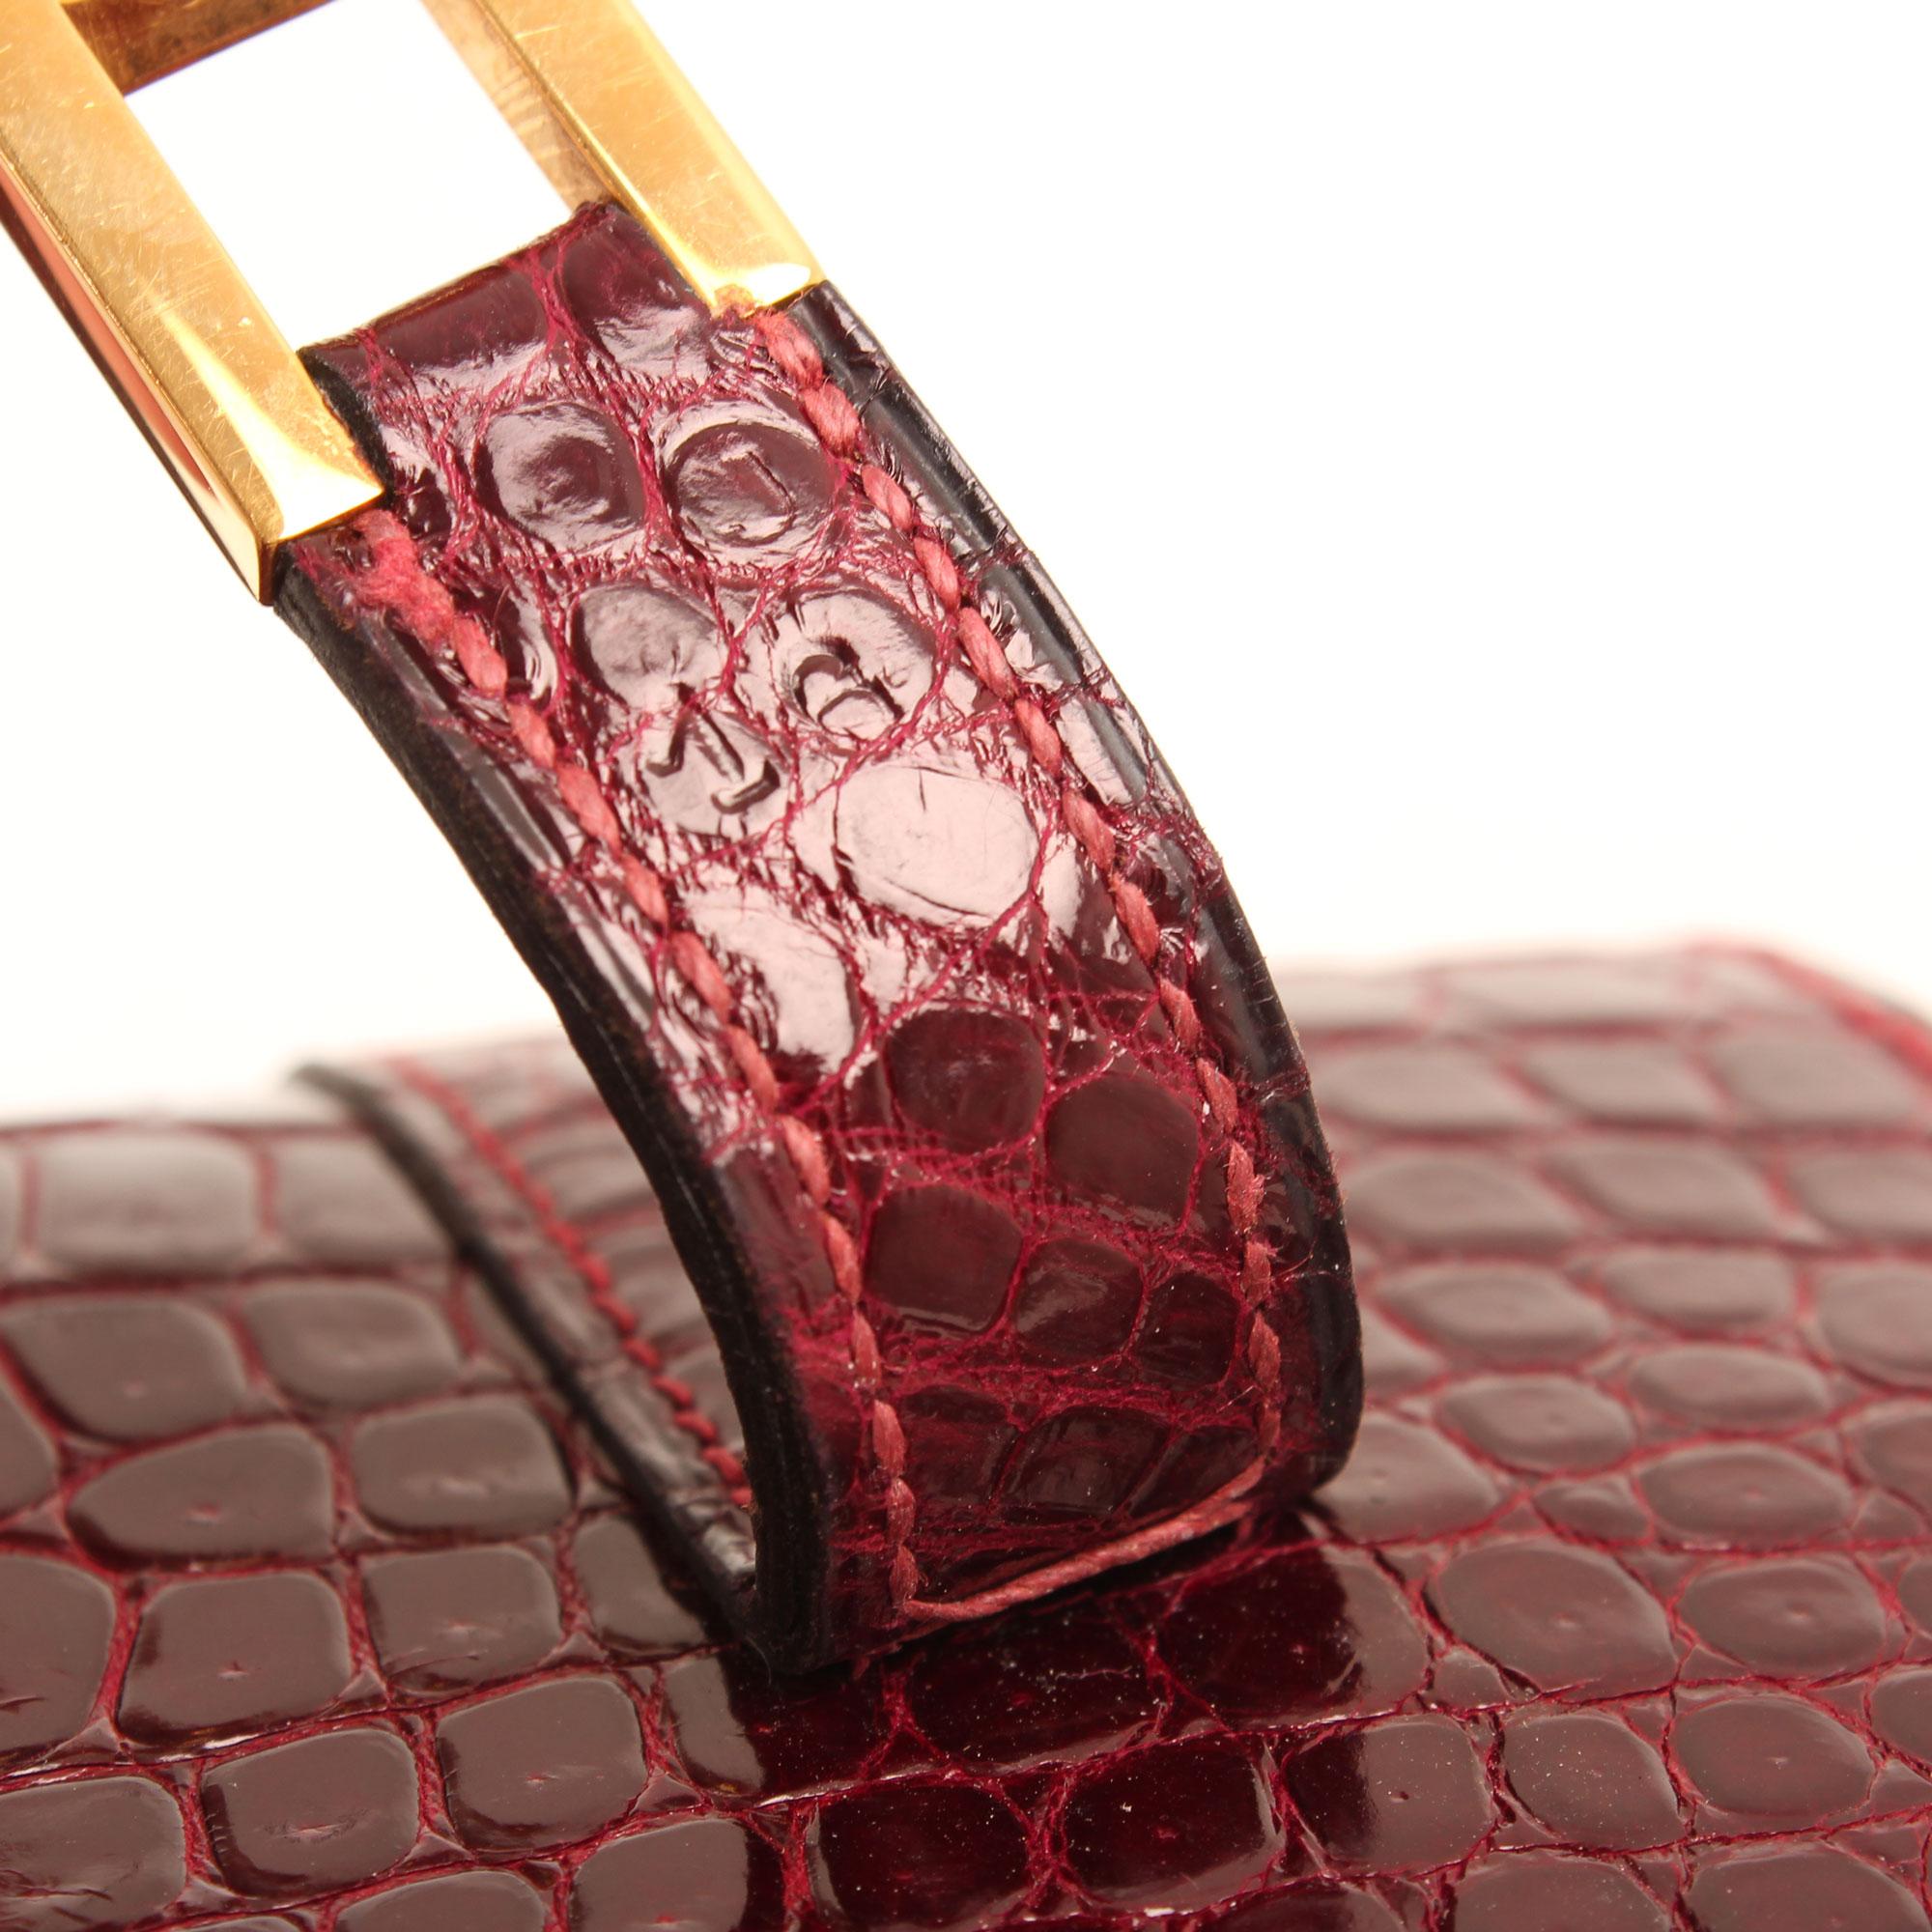 Imagen del serial number del bolso hermes drag vintage cocodrilo poroso color frambuesa